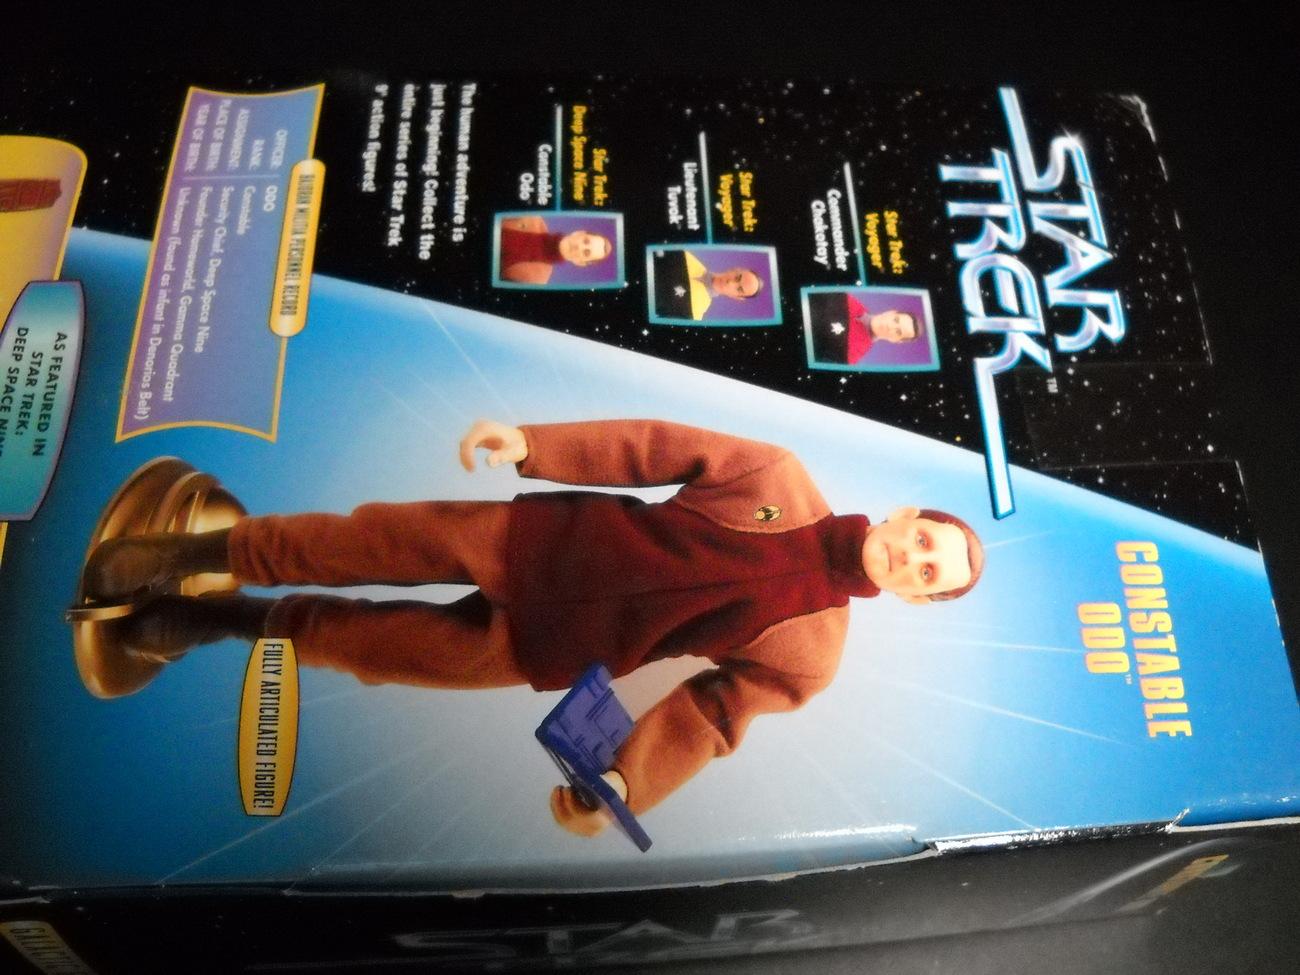 Star Trek Warp Factor One Constable Odo Deep Space Nine Playmates Sealed Box